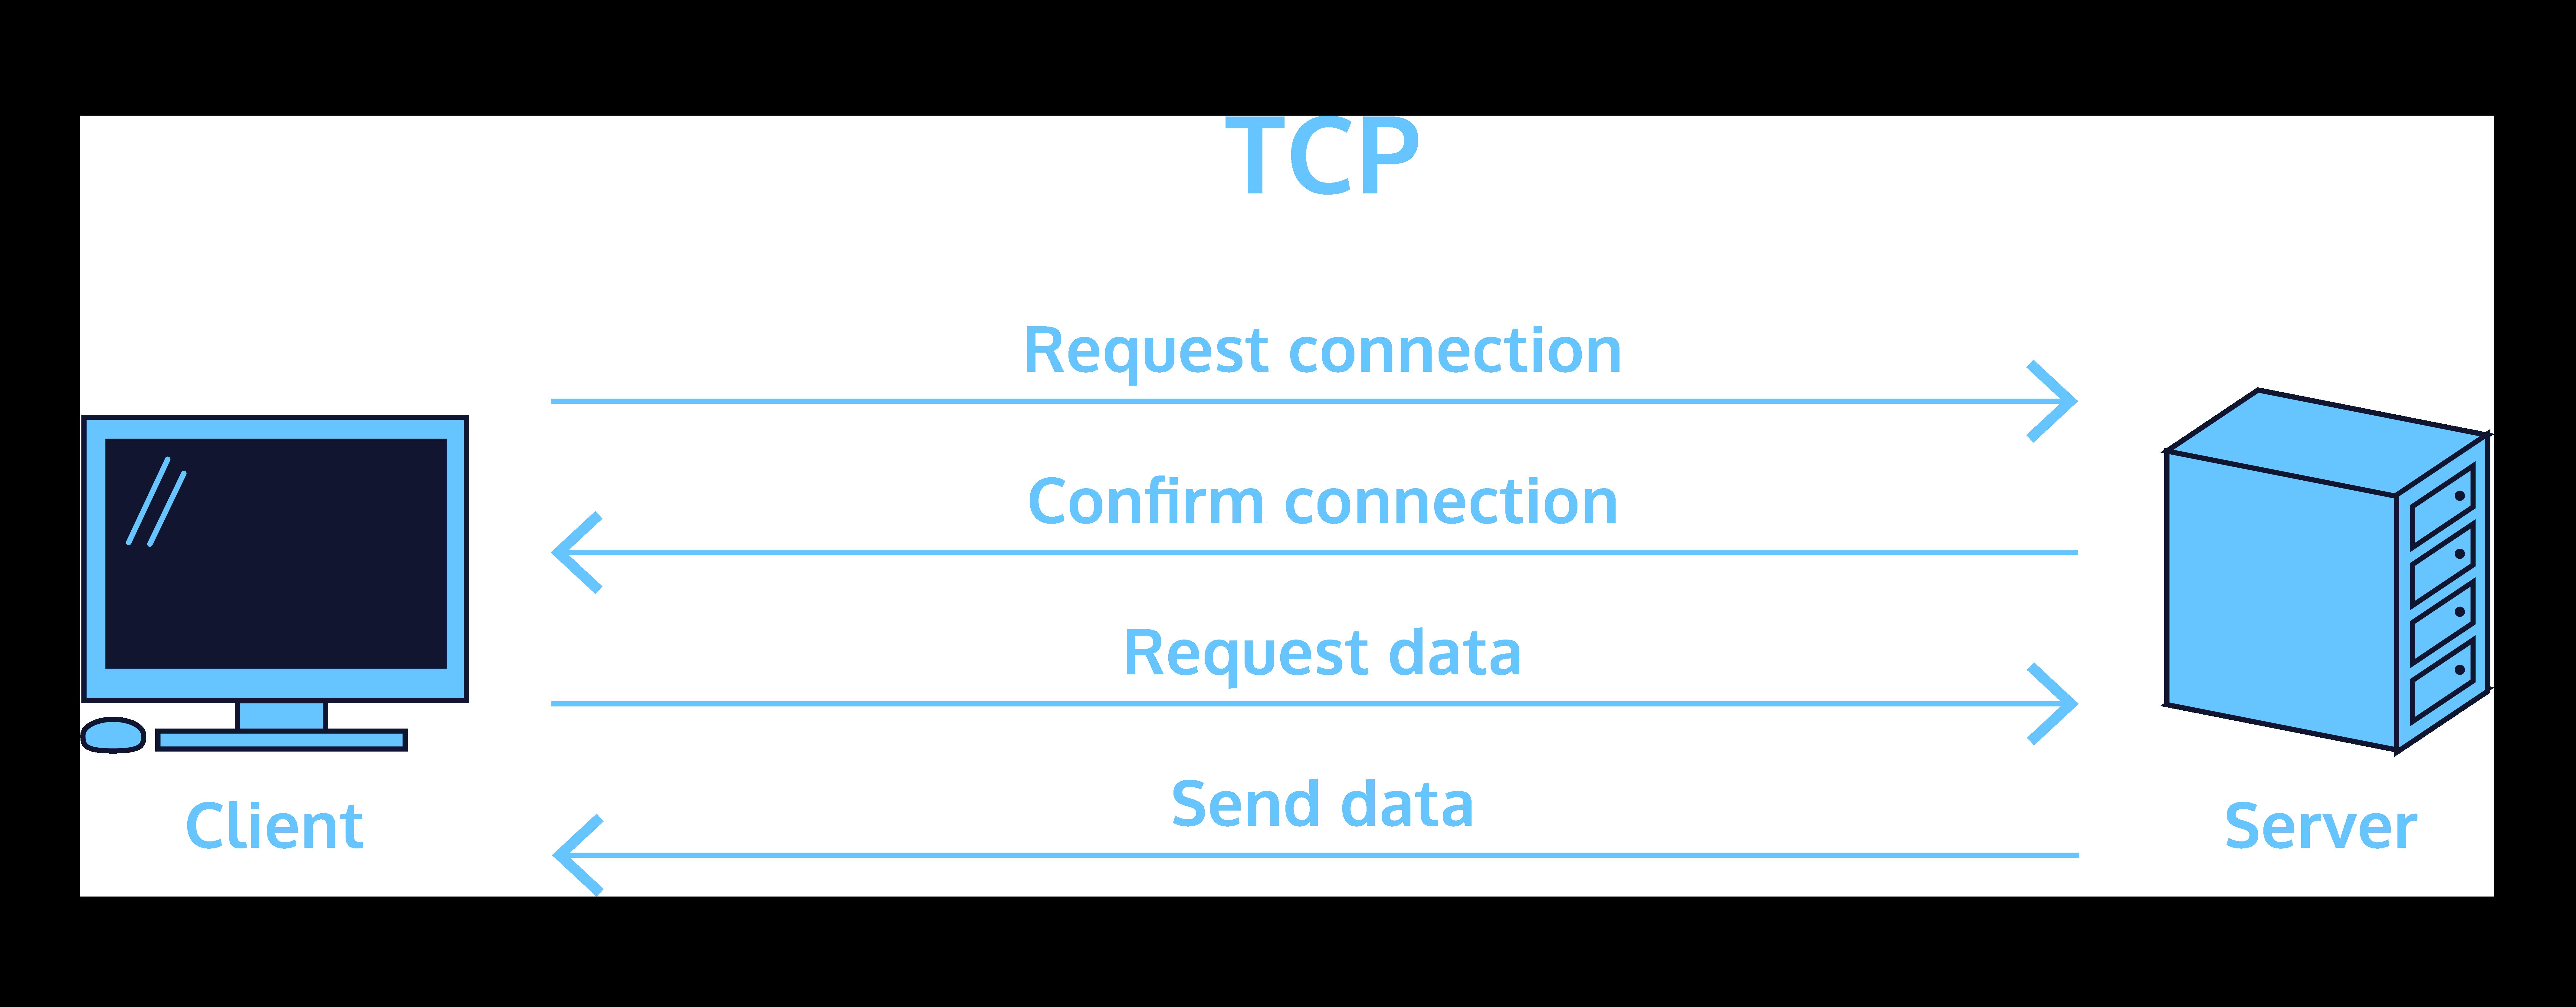 Diagram comparing data flow in TCP.